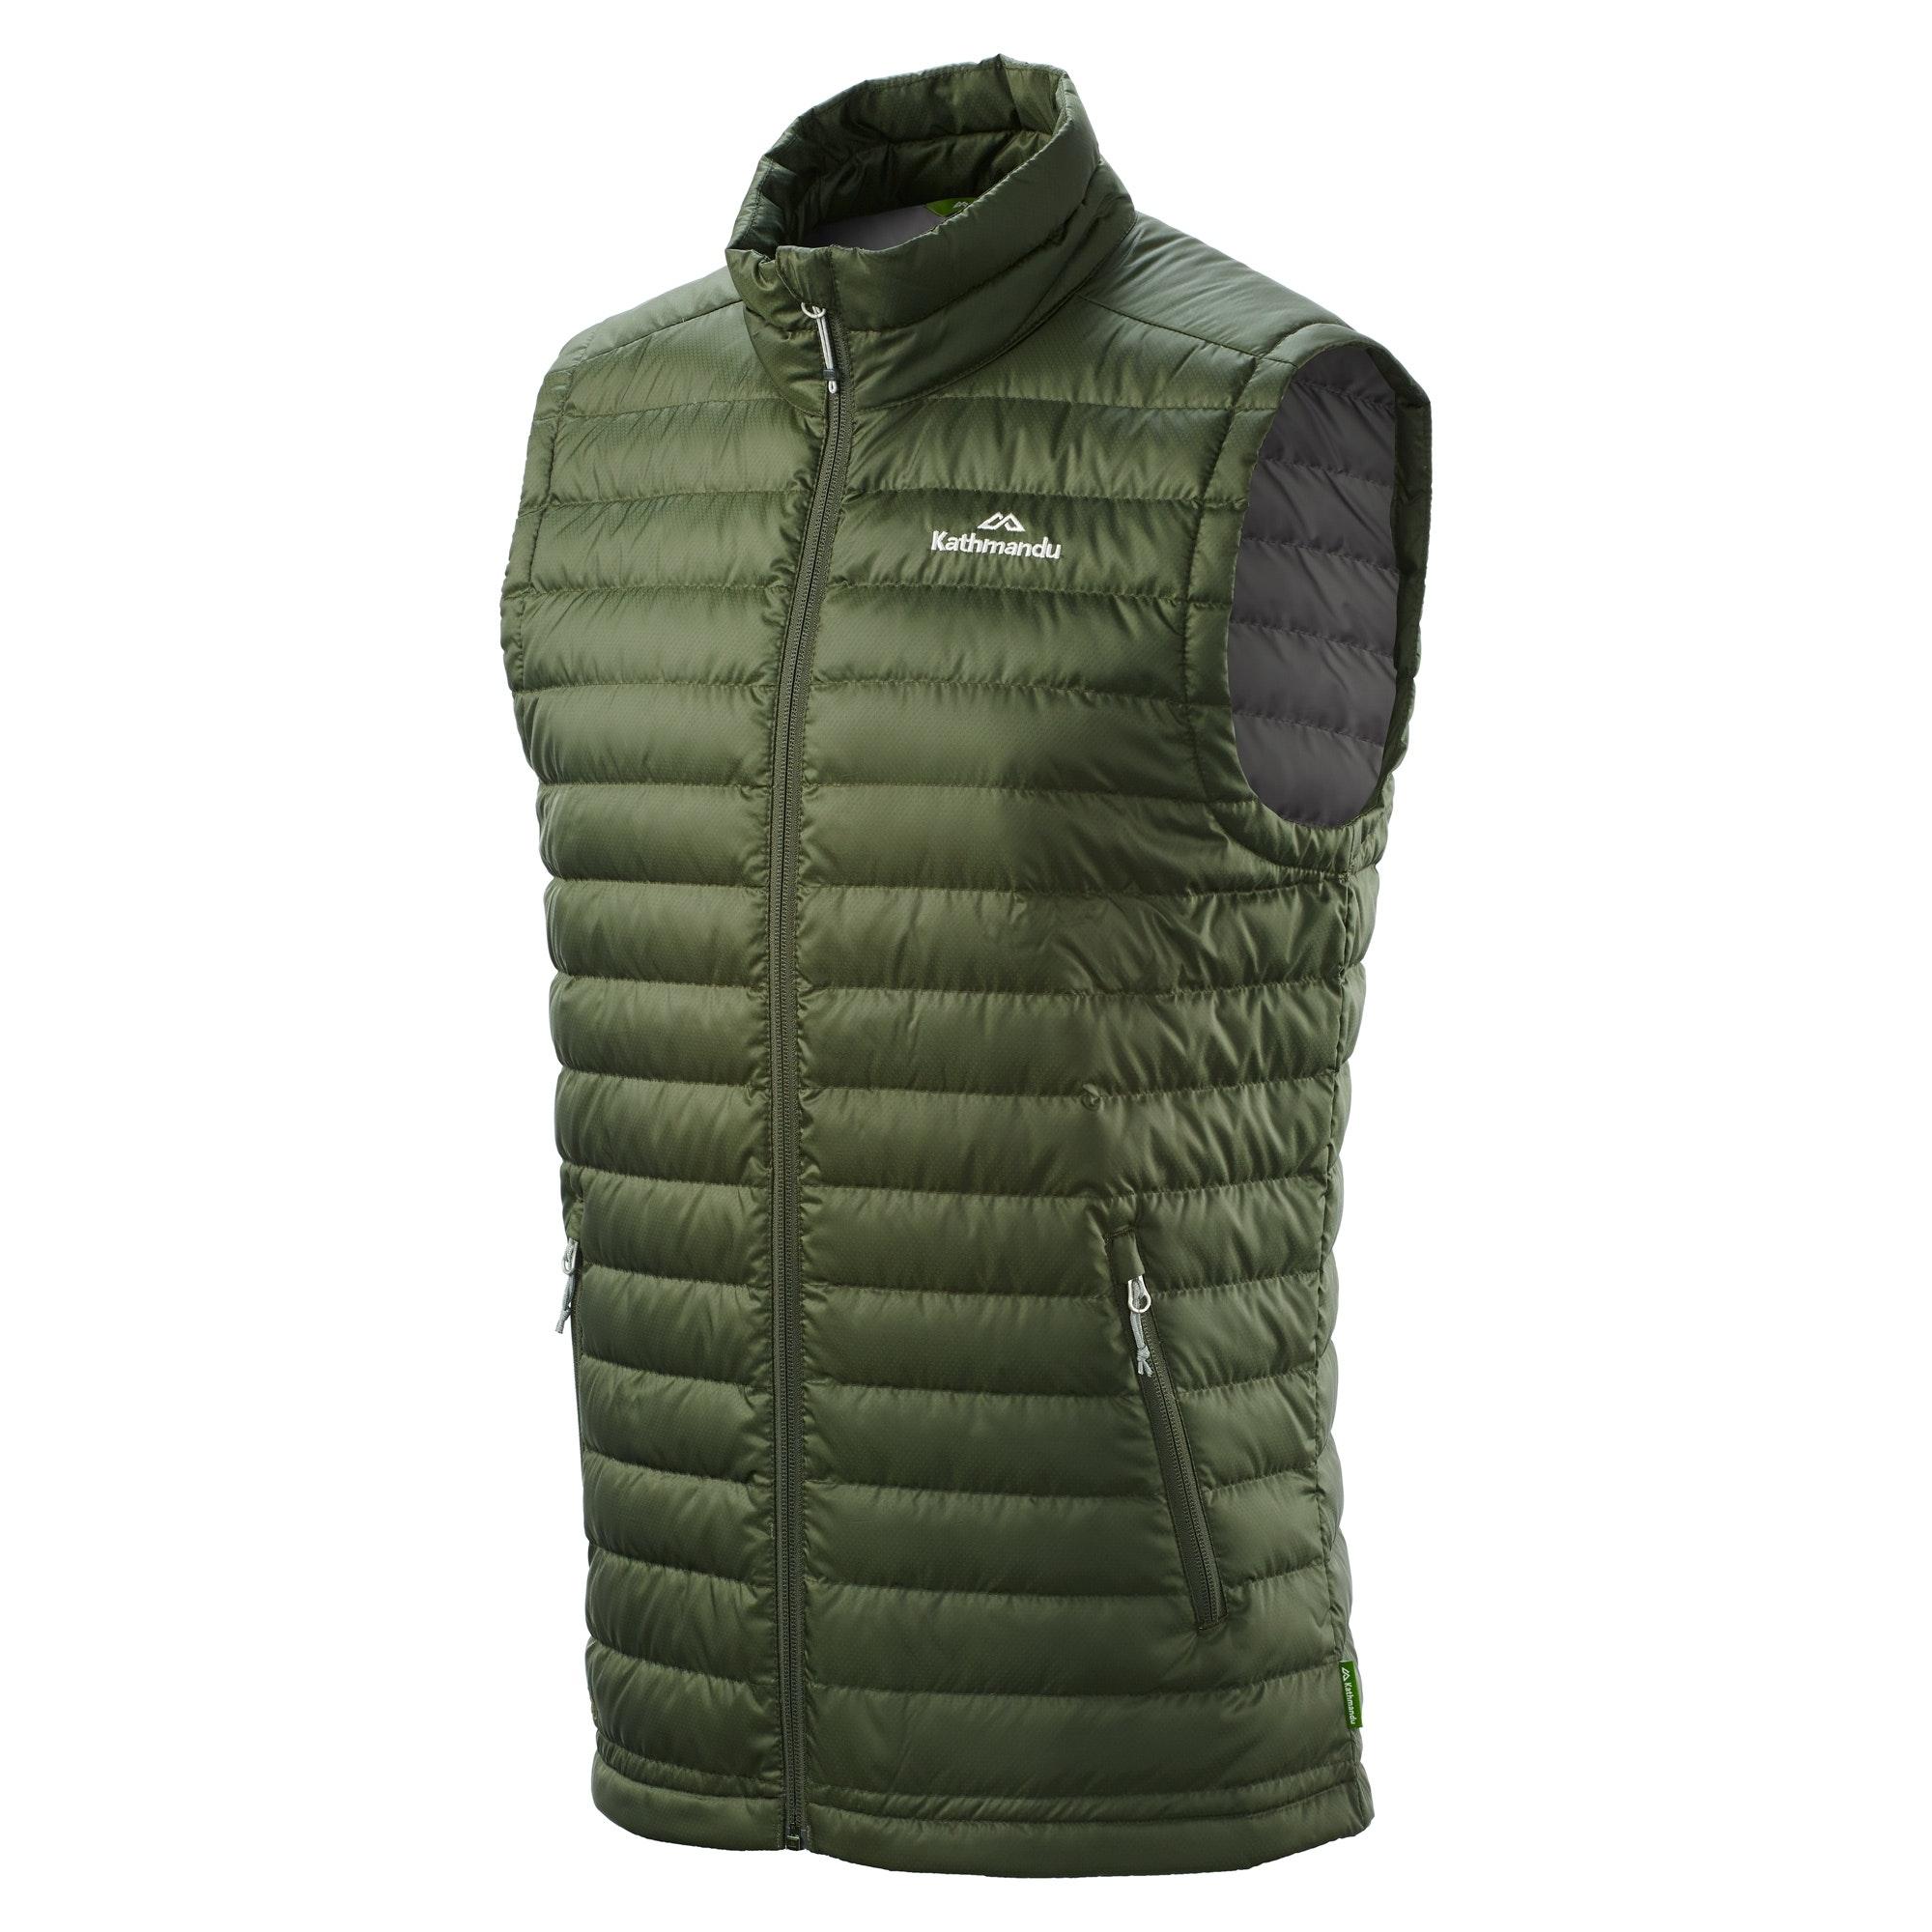 NEW-Kathmandu-Heli-Men-039-s-Lightweight-Duck-Down-Warm-Insultated-Puffer-Vest-v2